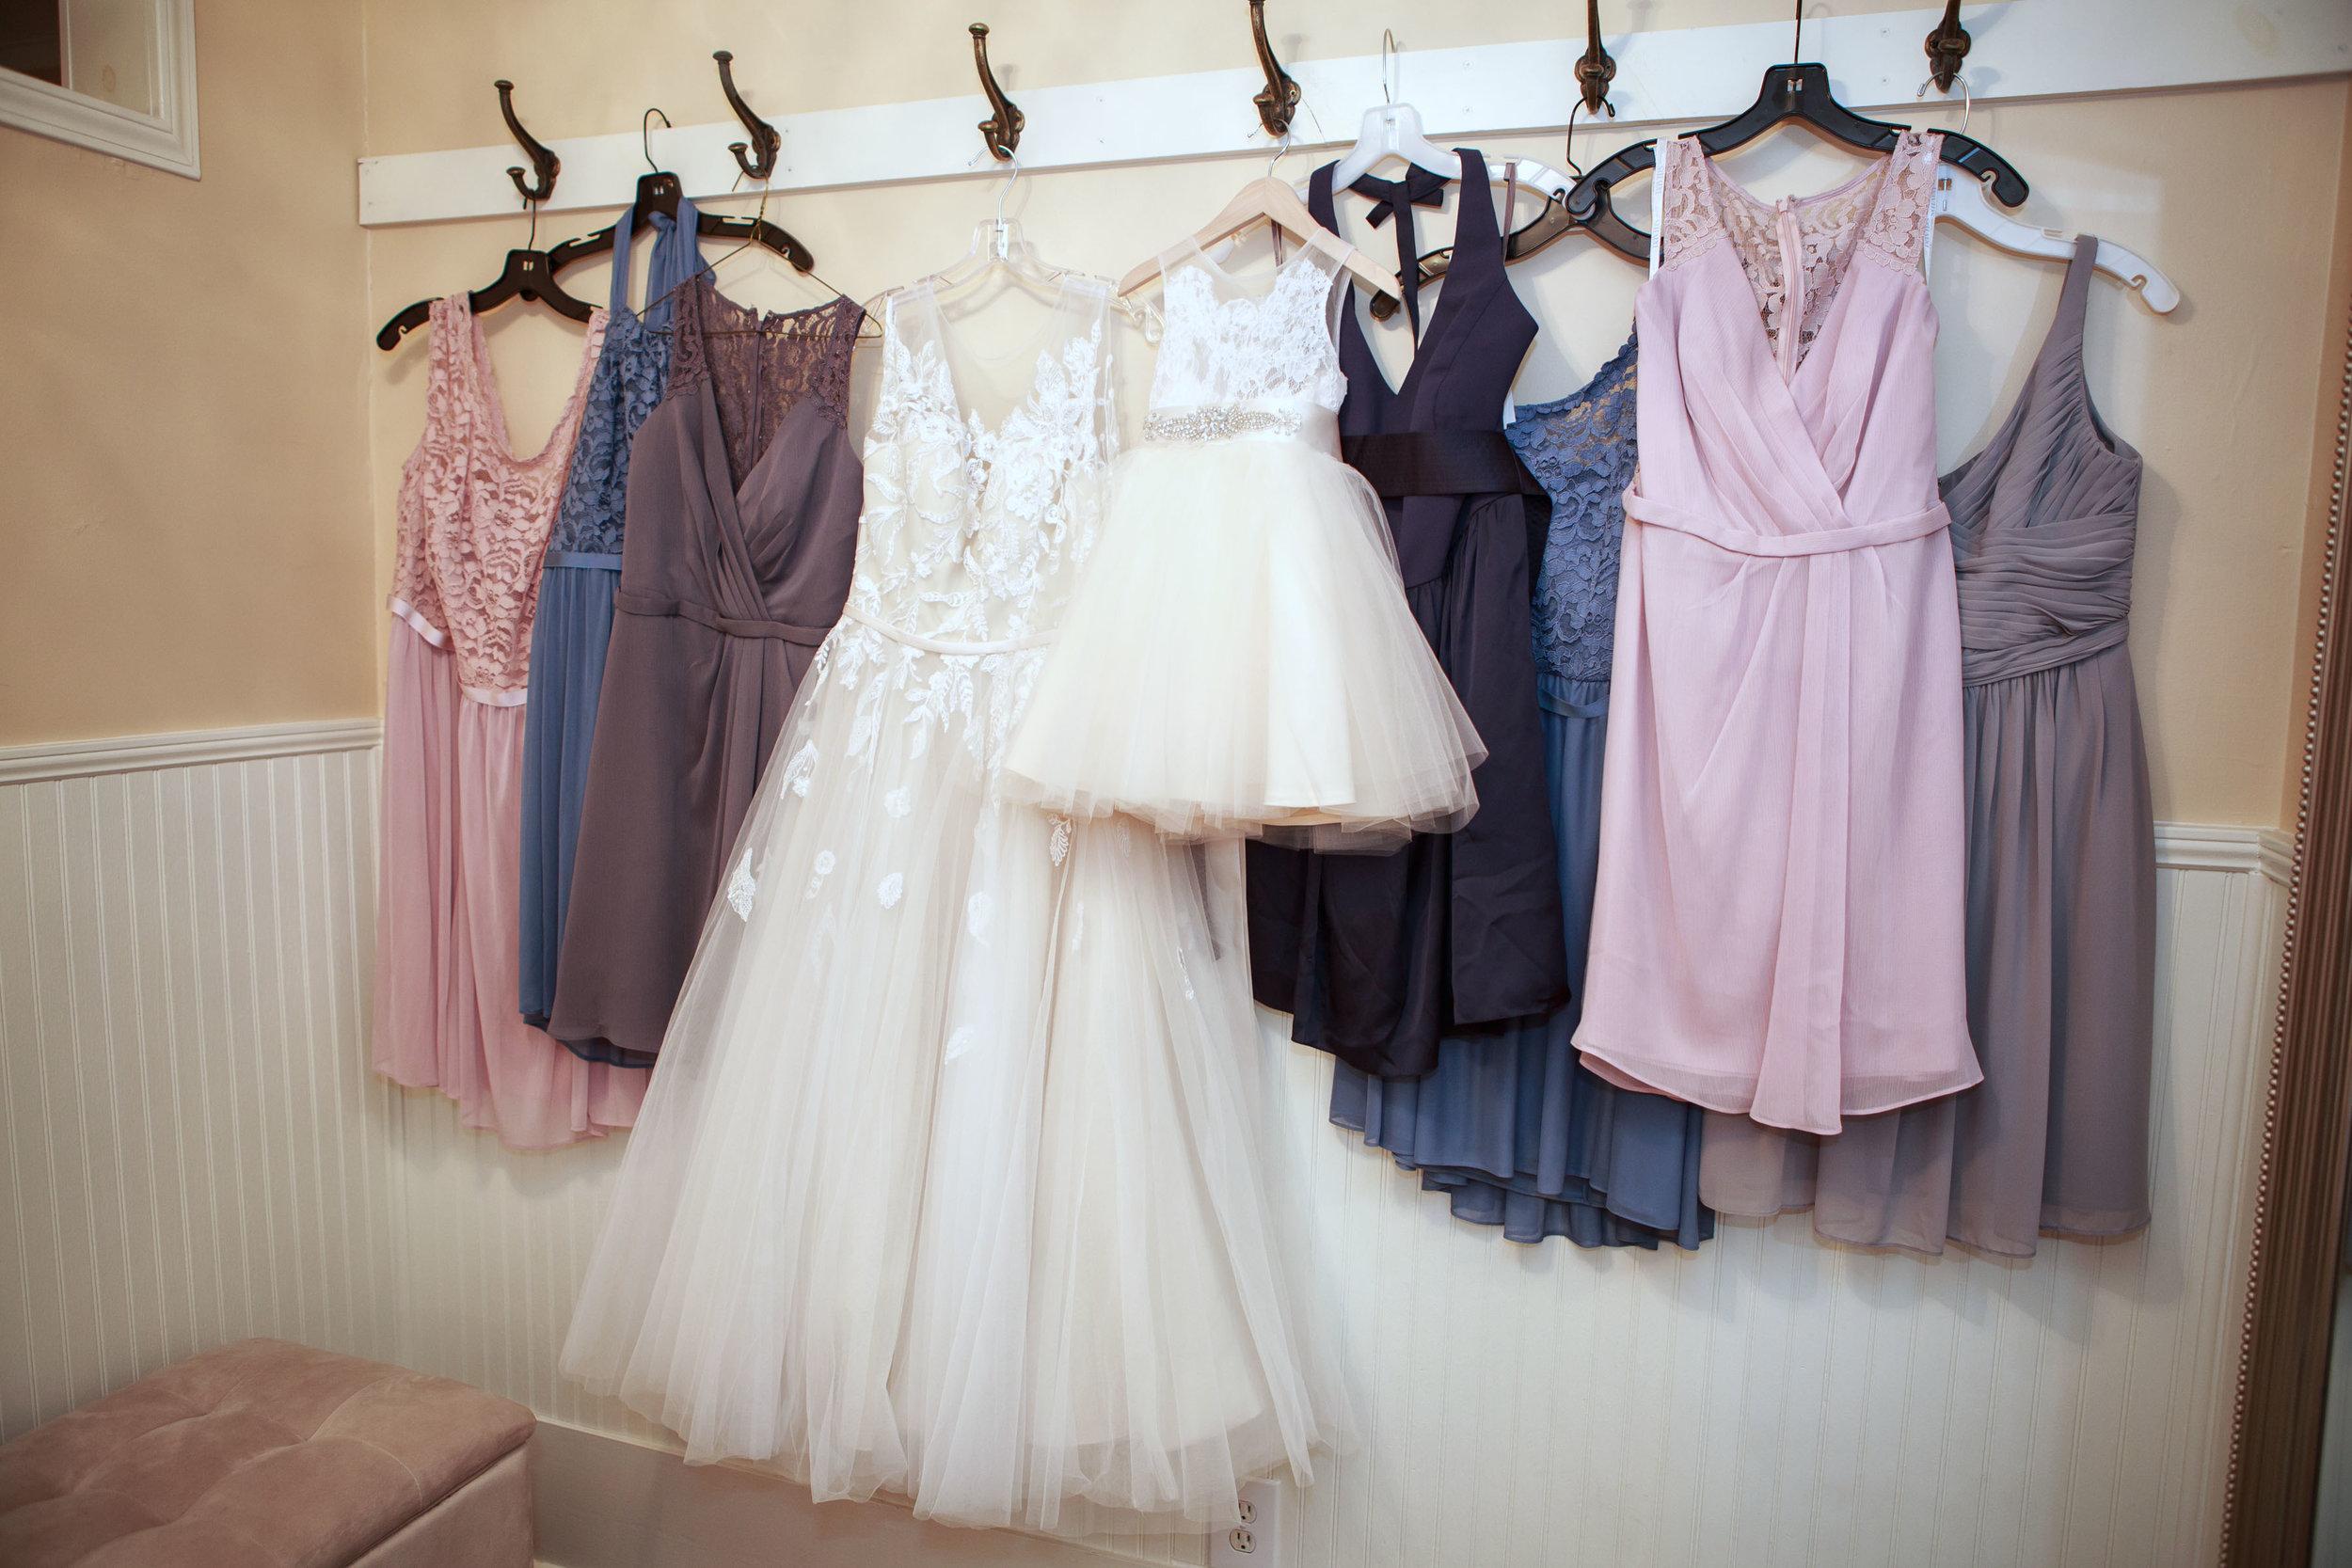 128-South-Wedding-Tiffany-Abruzzo-Photography-Girls-Prep-62.jpg